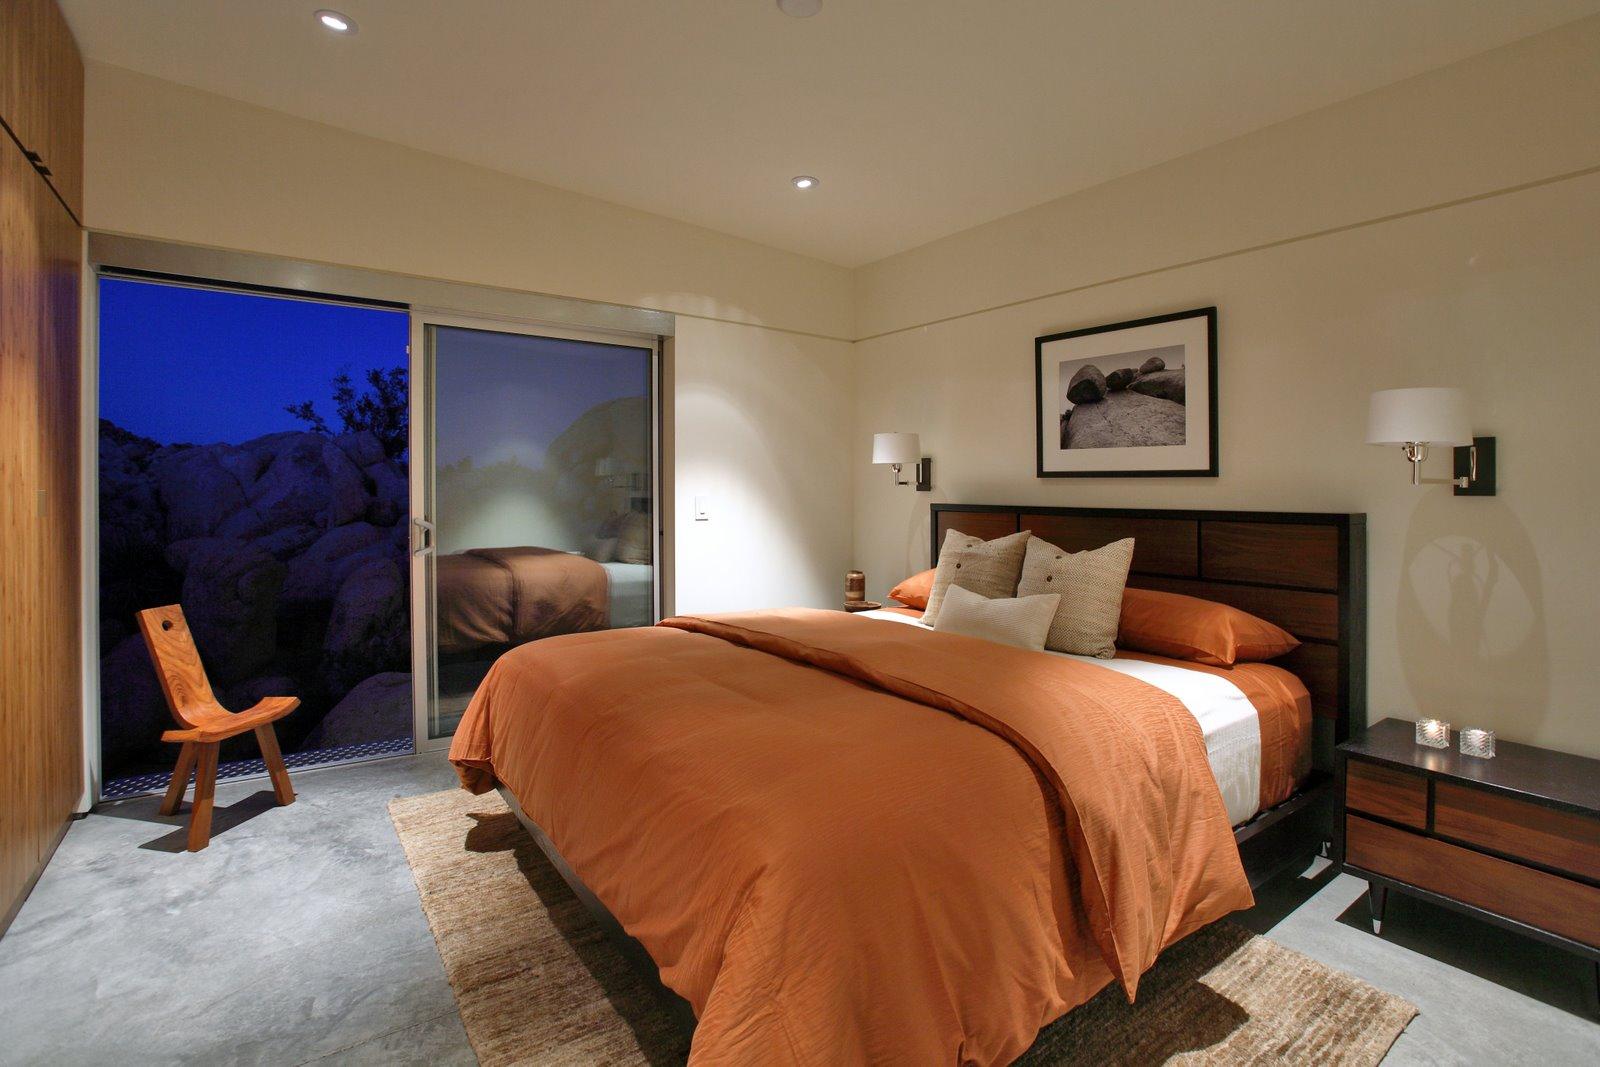 bluesky_bedroom_1